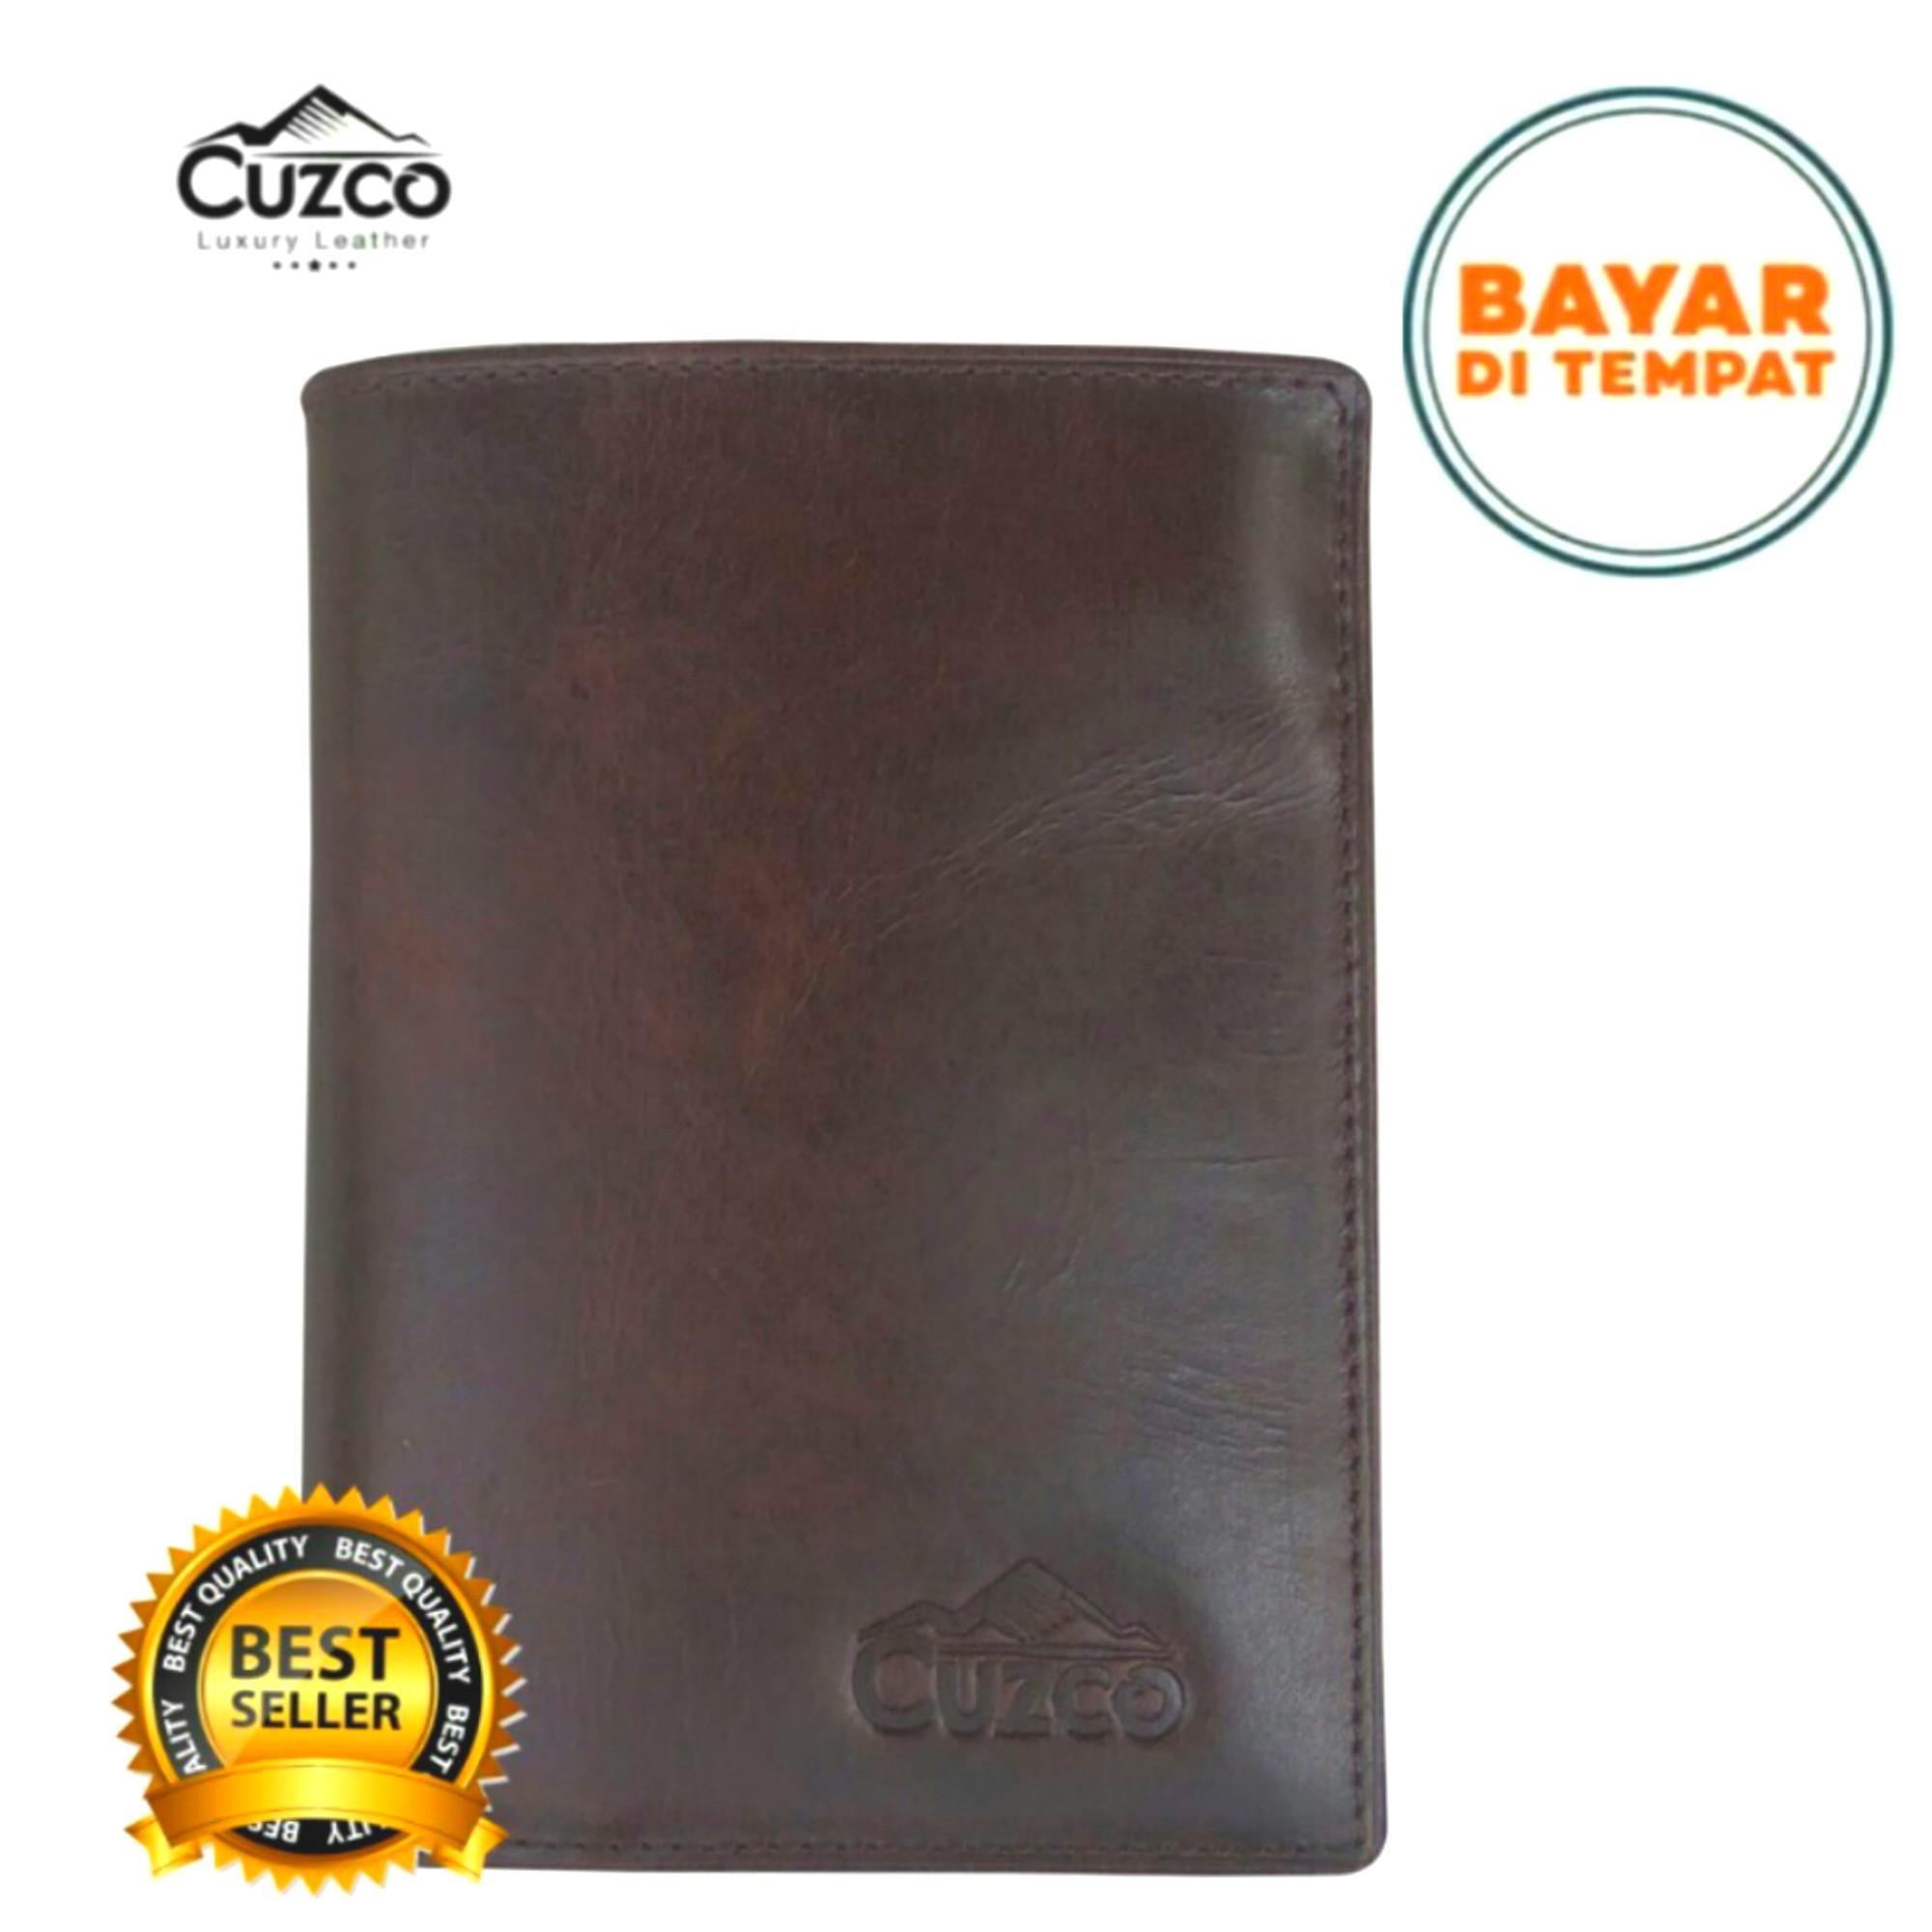 Cuzco - Dompet Kulit 3/4 Pria - Coklat- Kulit Asli - Pull Up- Kulit Pria By Tiger Leather